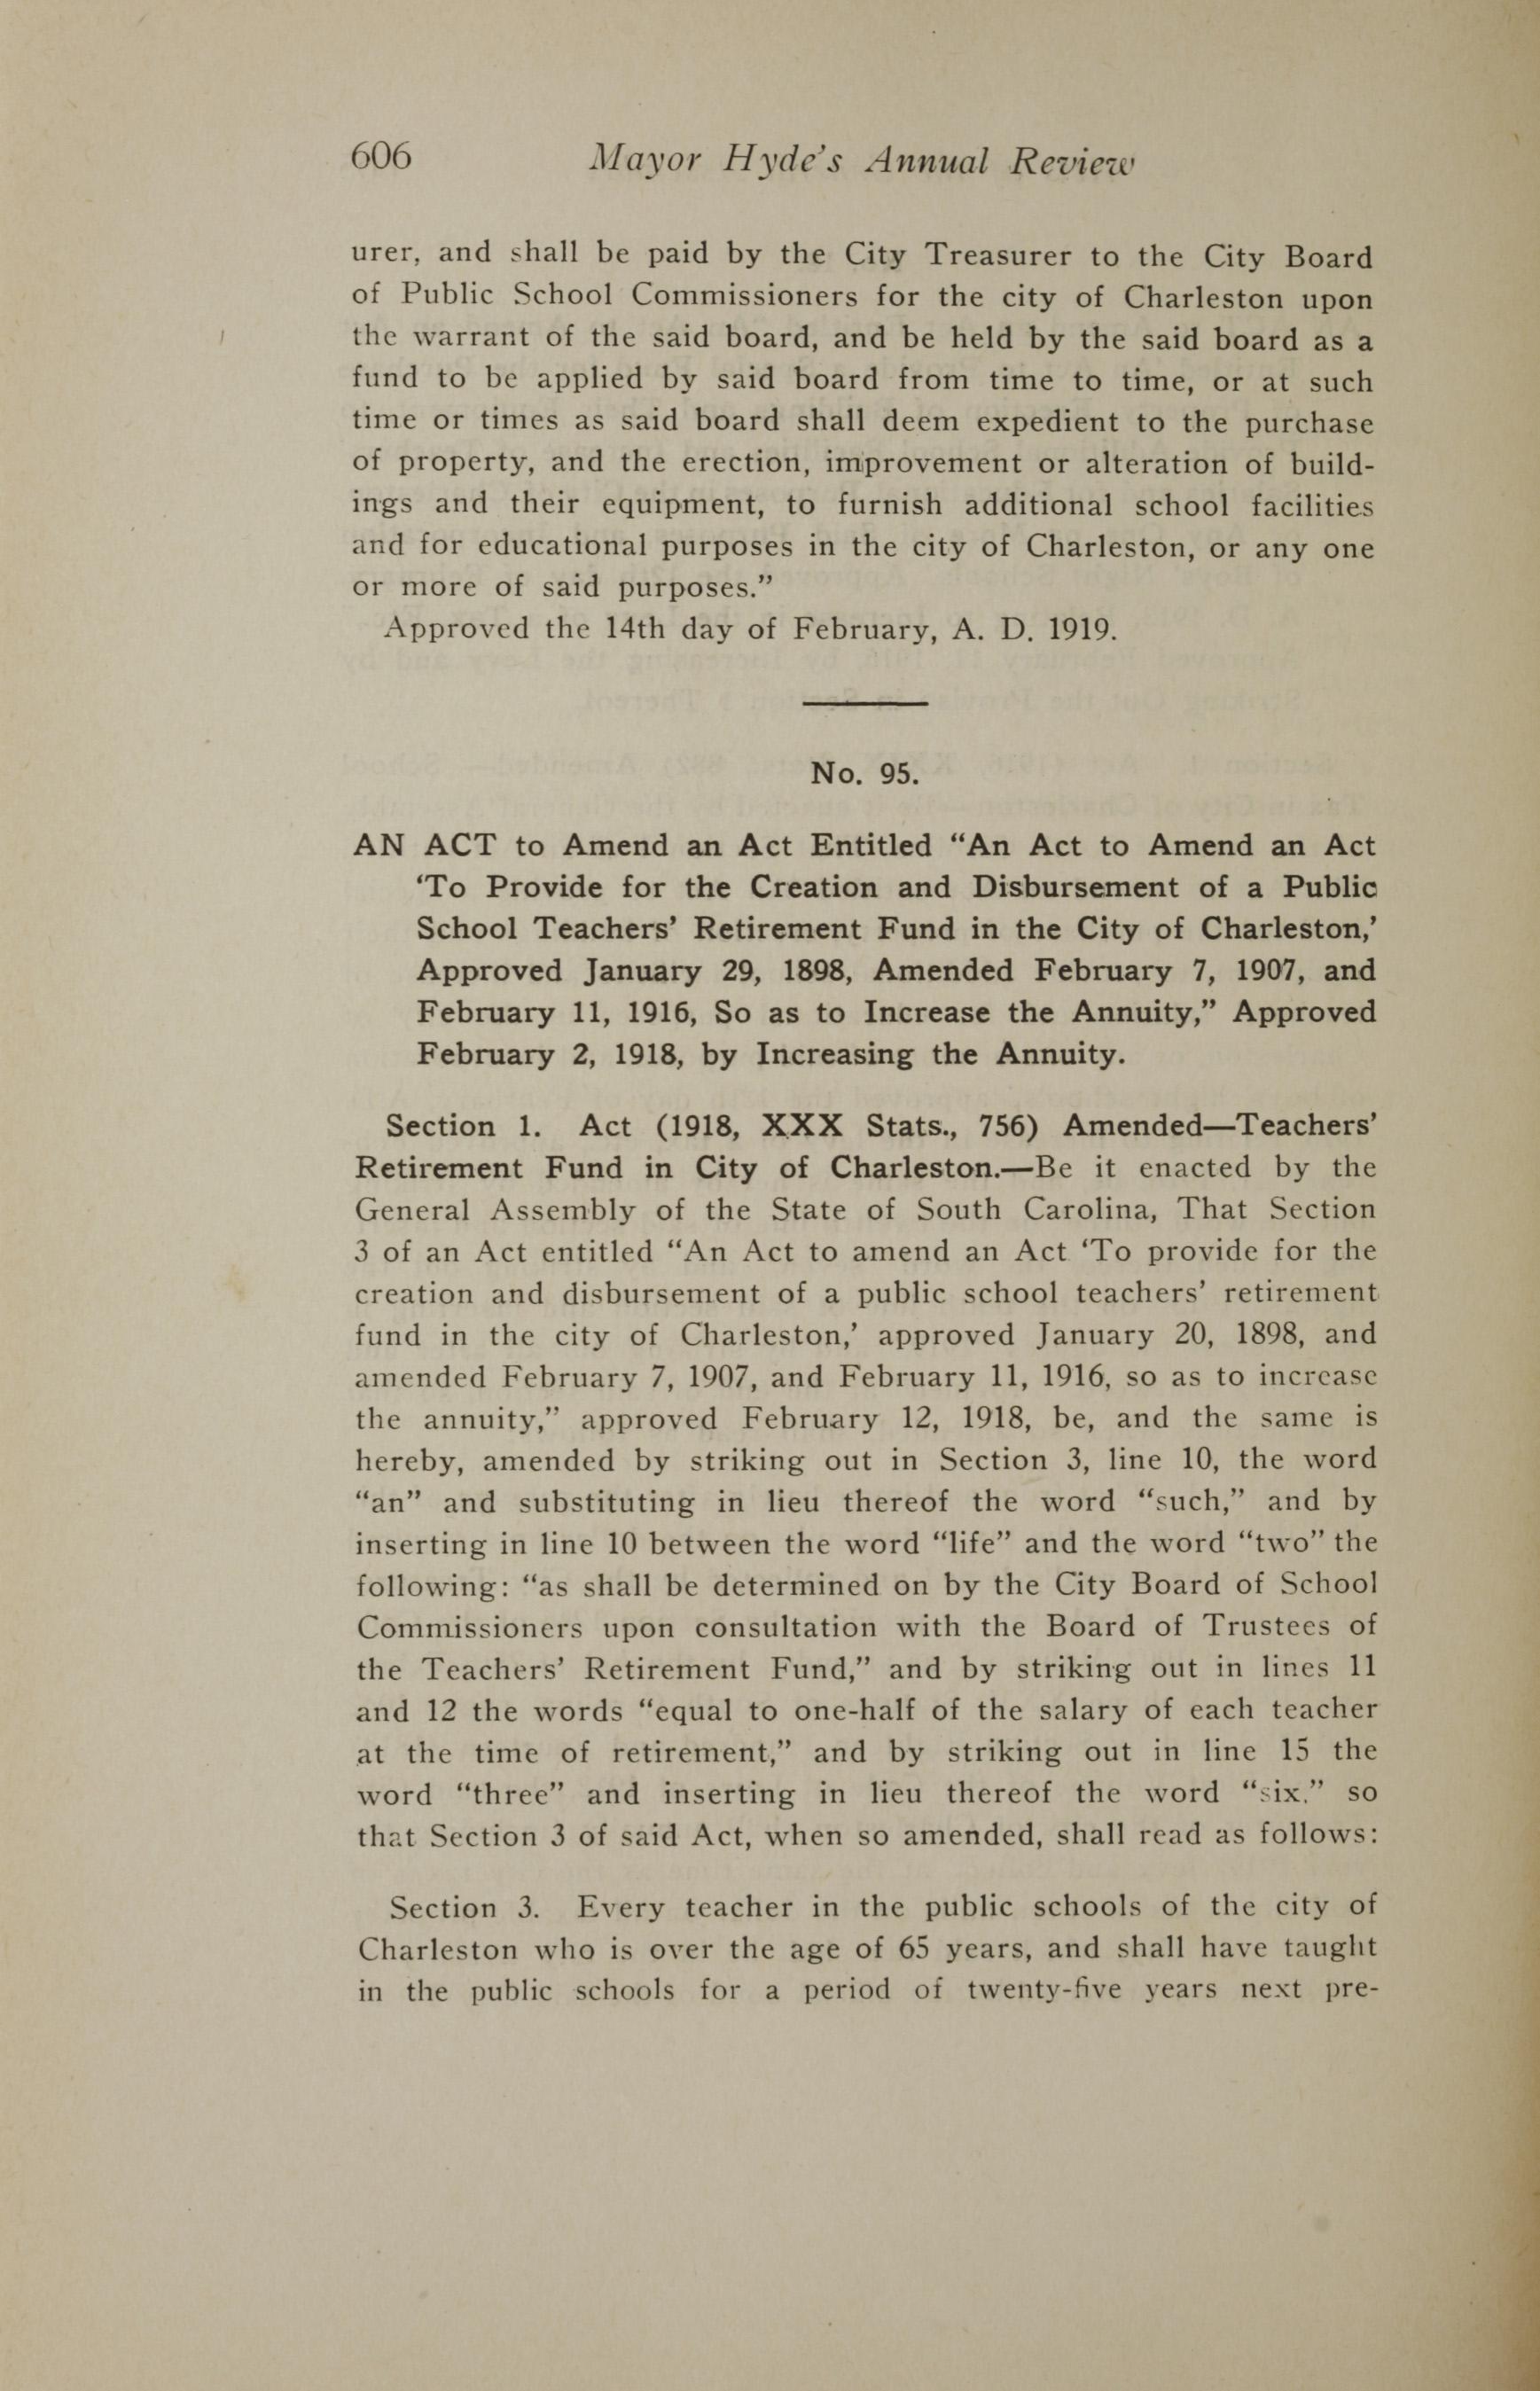 Charleston Yearbook, 1919, page 606